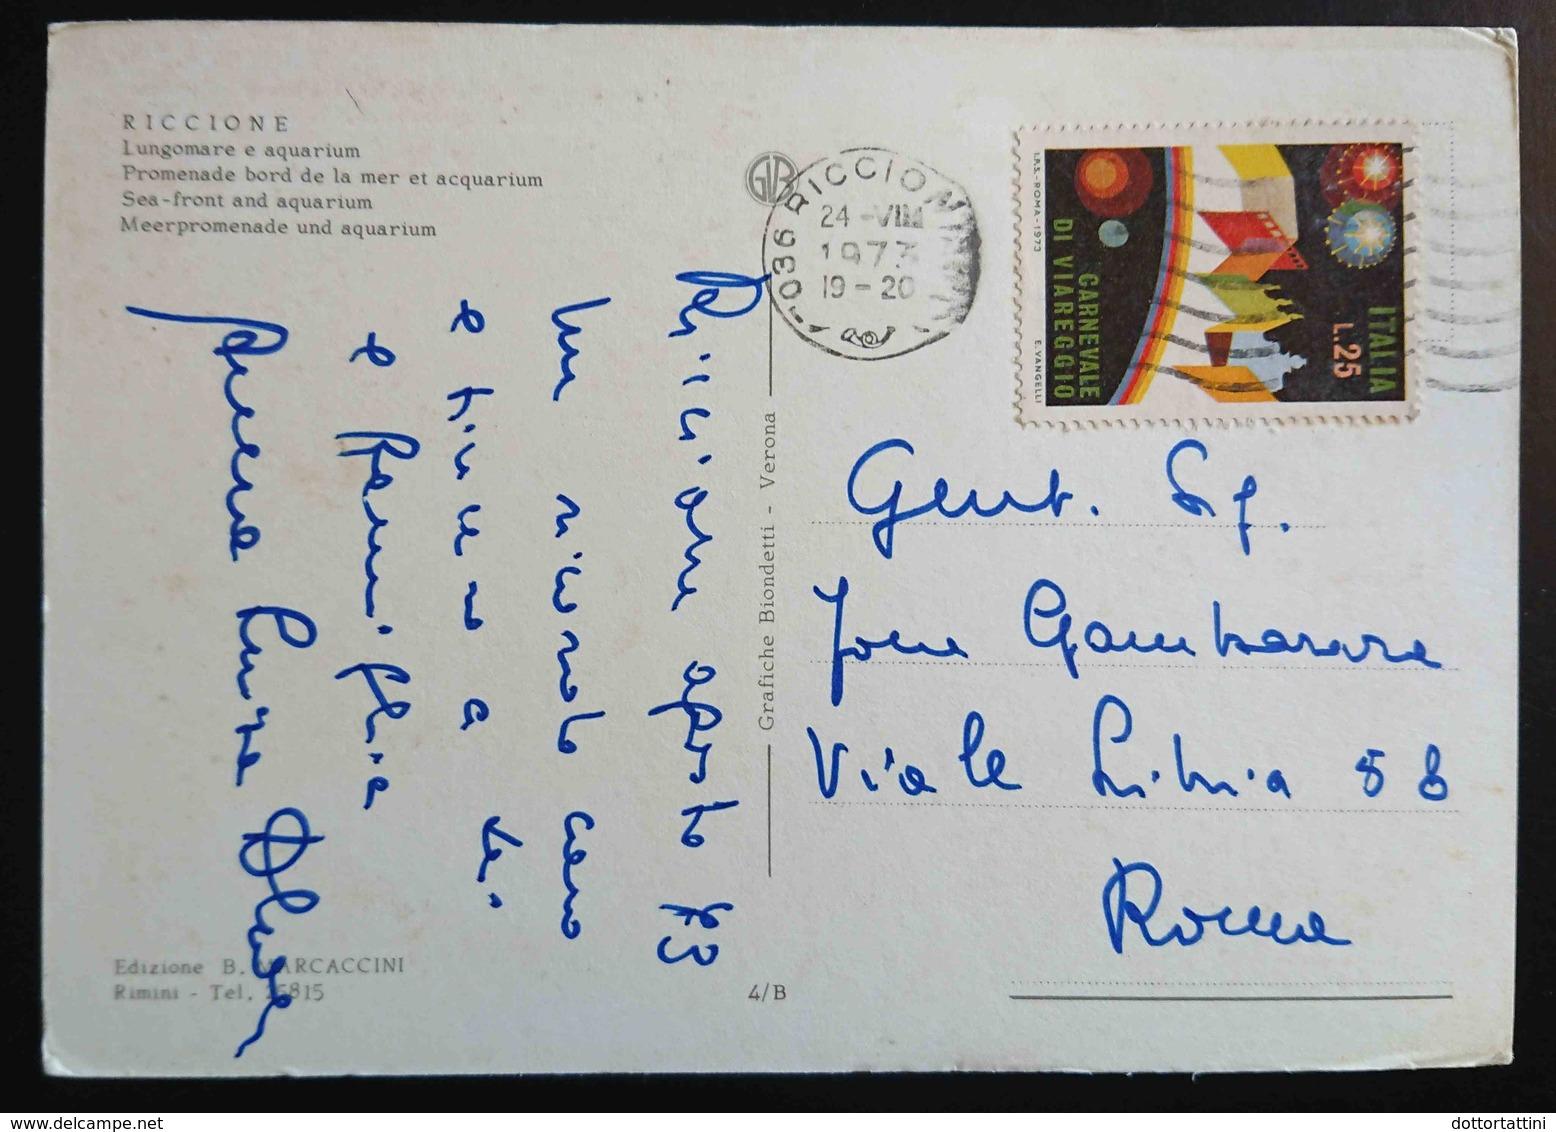 RICCIONE - Lungomare E Acquarium  - Vg Nice Stamp R2 - Rimini